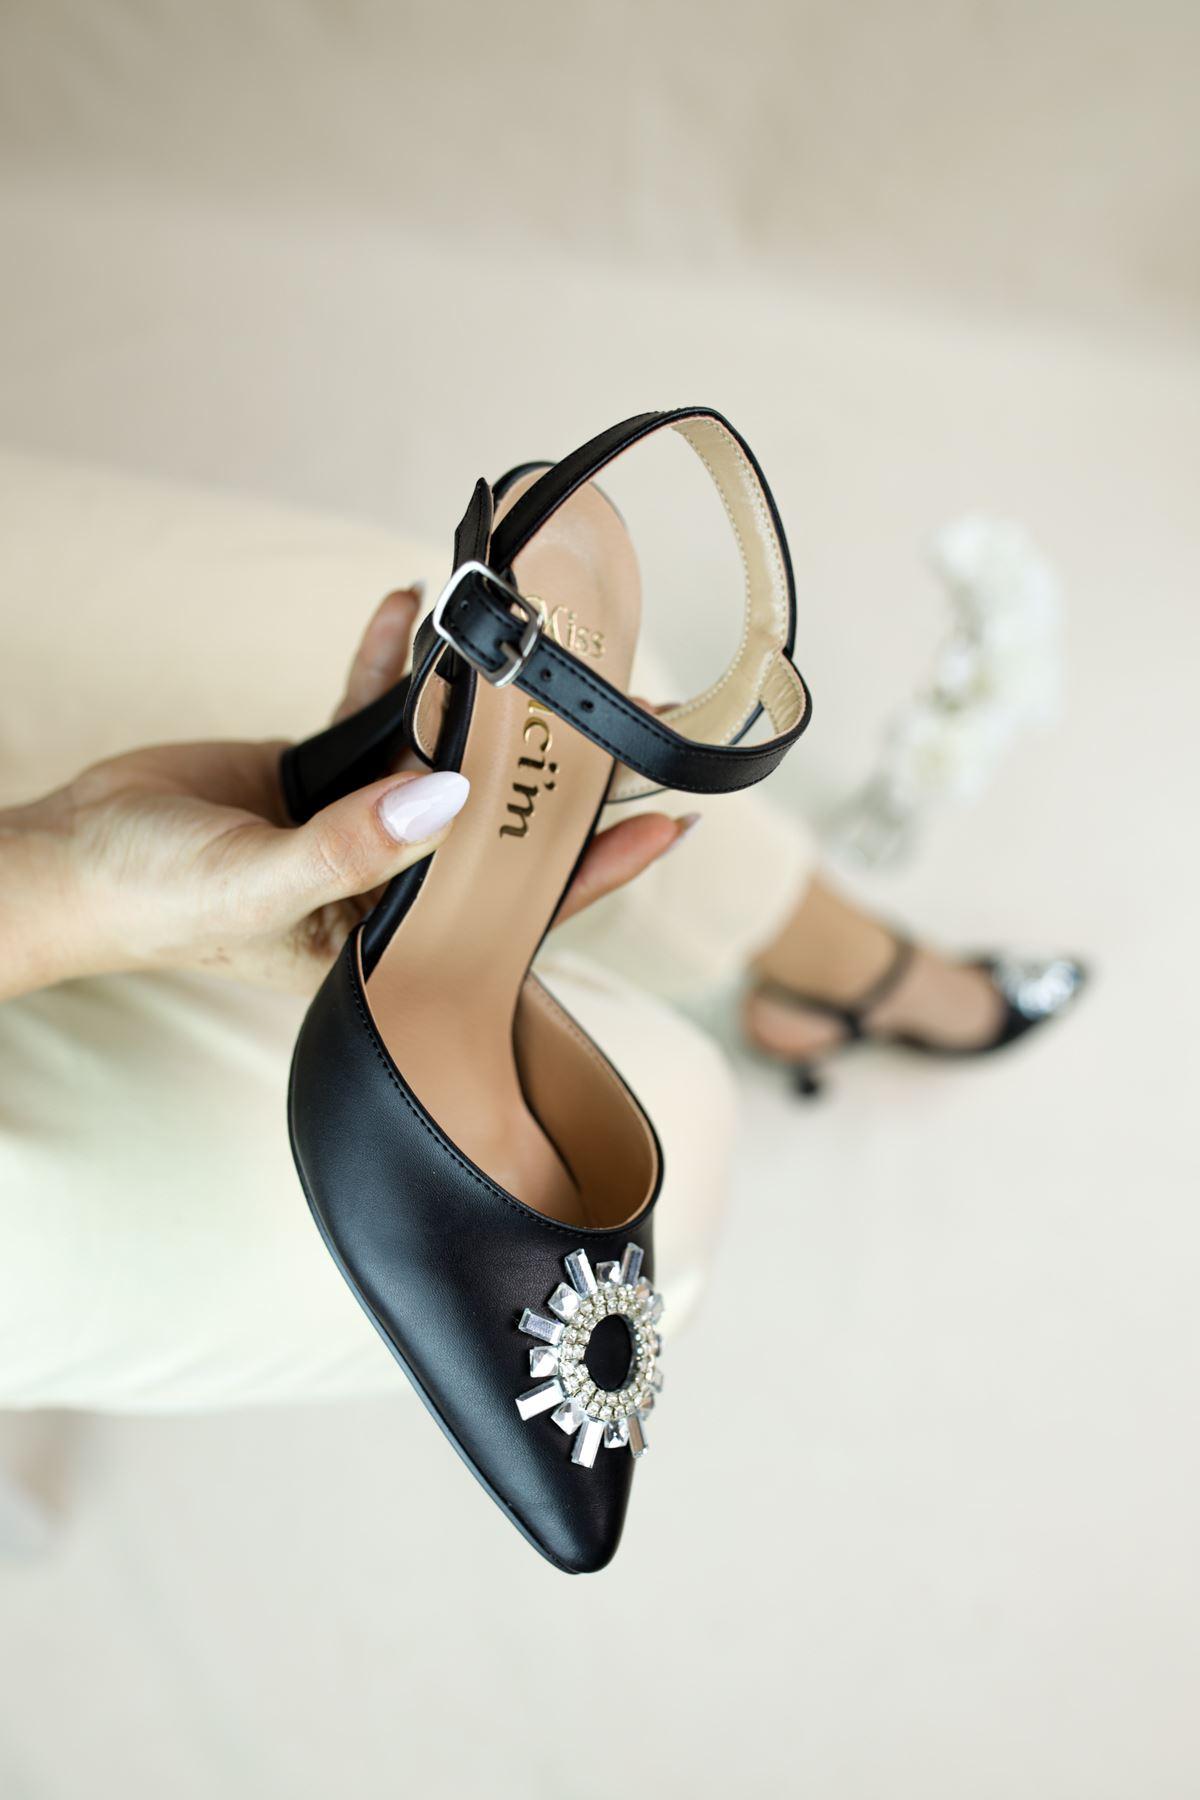 Bella Siyah Mat Deri Kadın Topuklu Ayakkabı